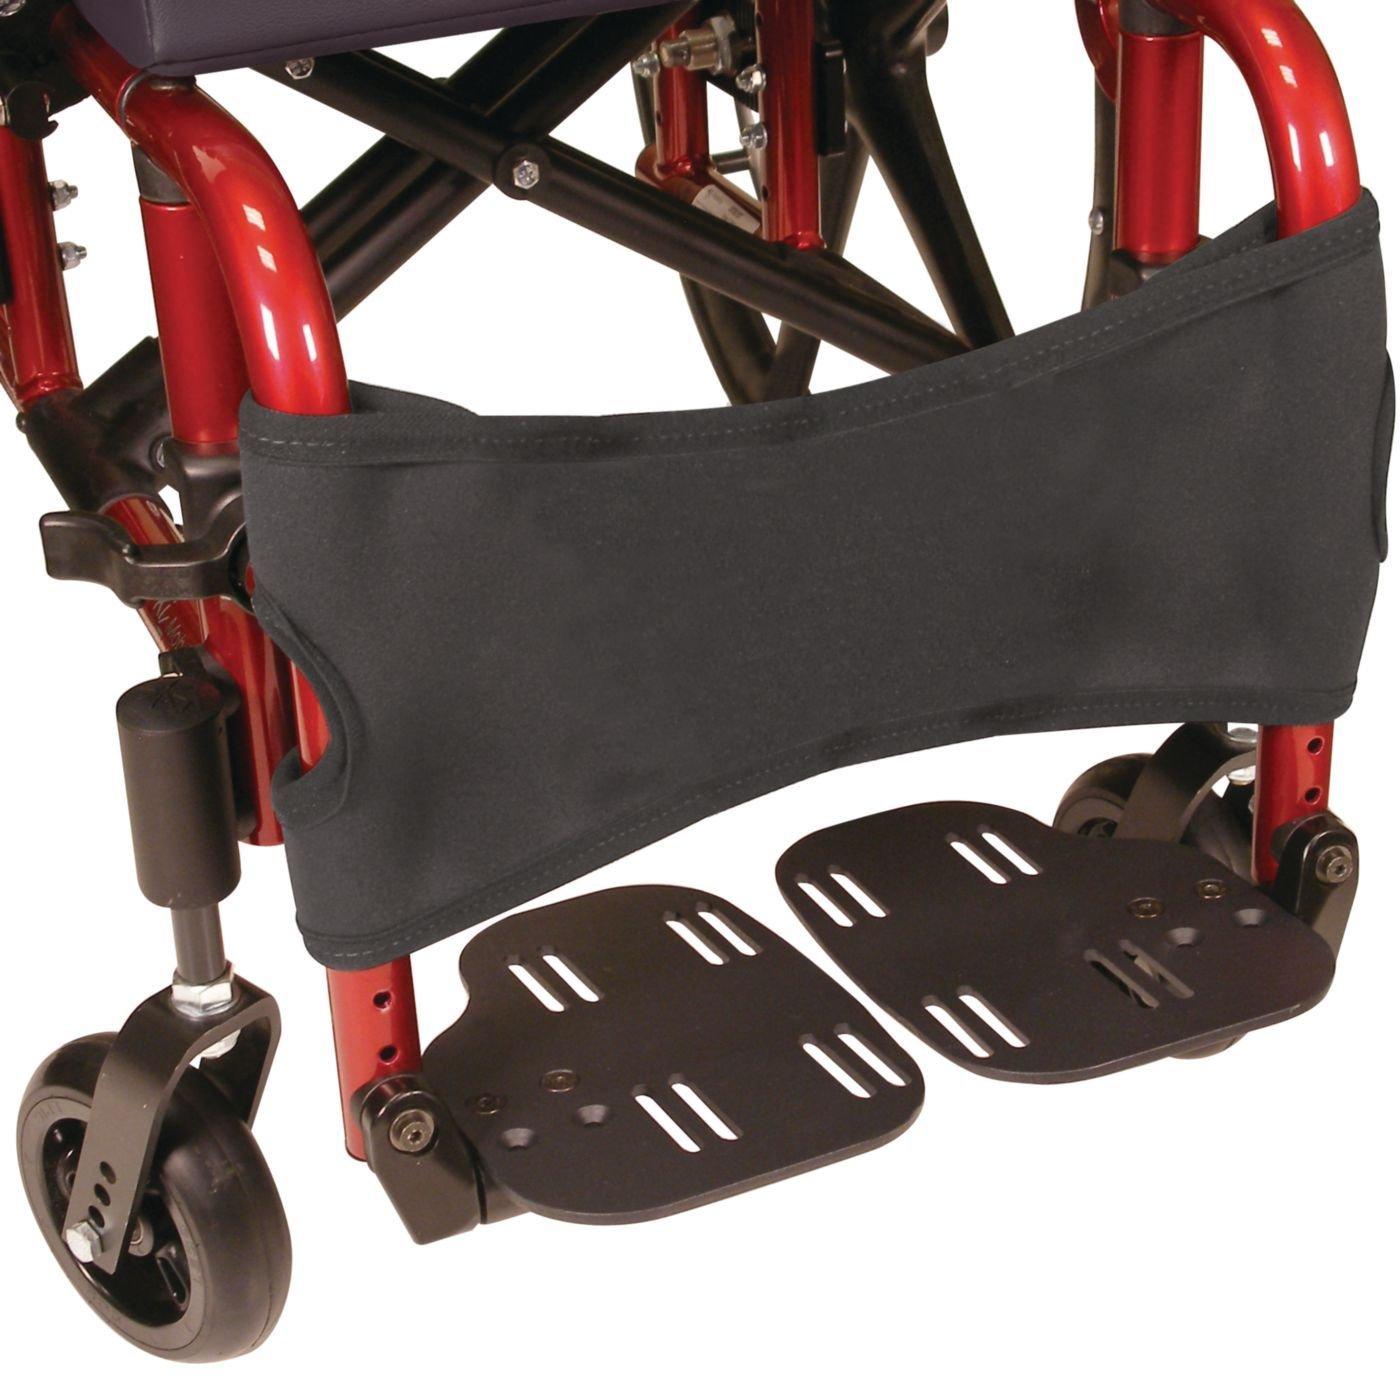 Therafin Calf Panel, Convenience Pocket, Medium, Wheelchair Leg Support